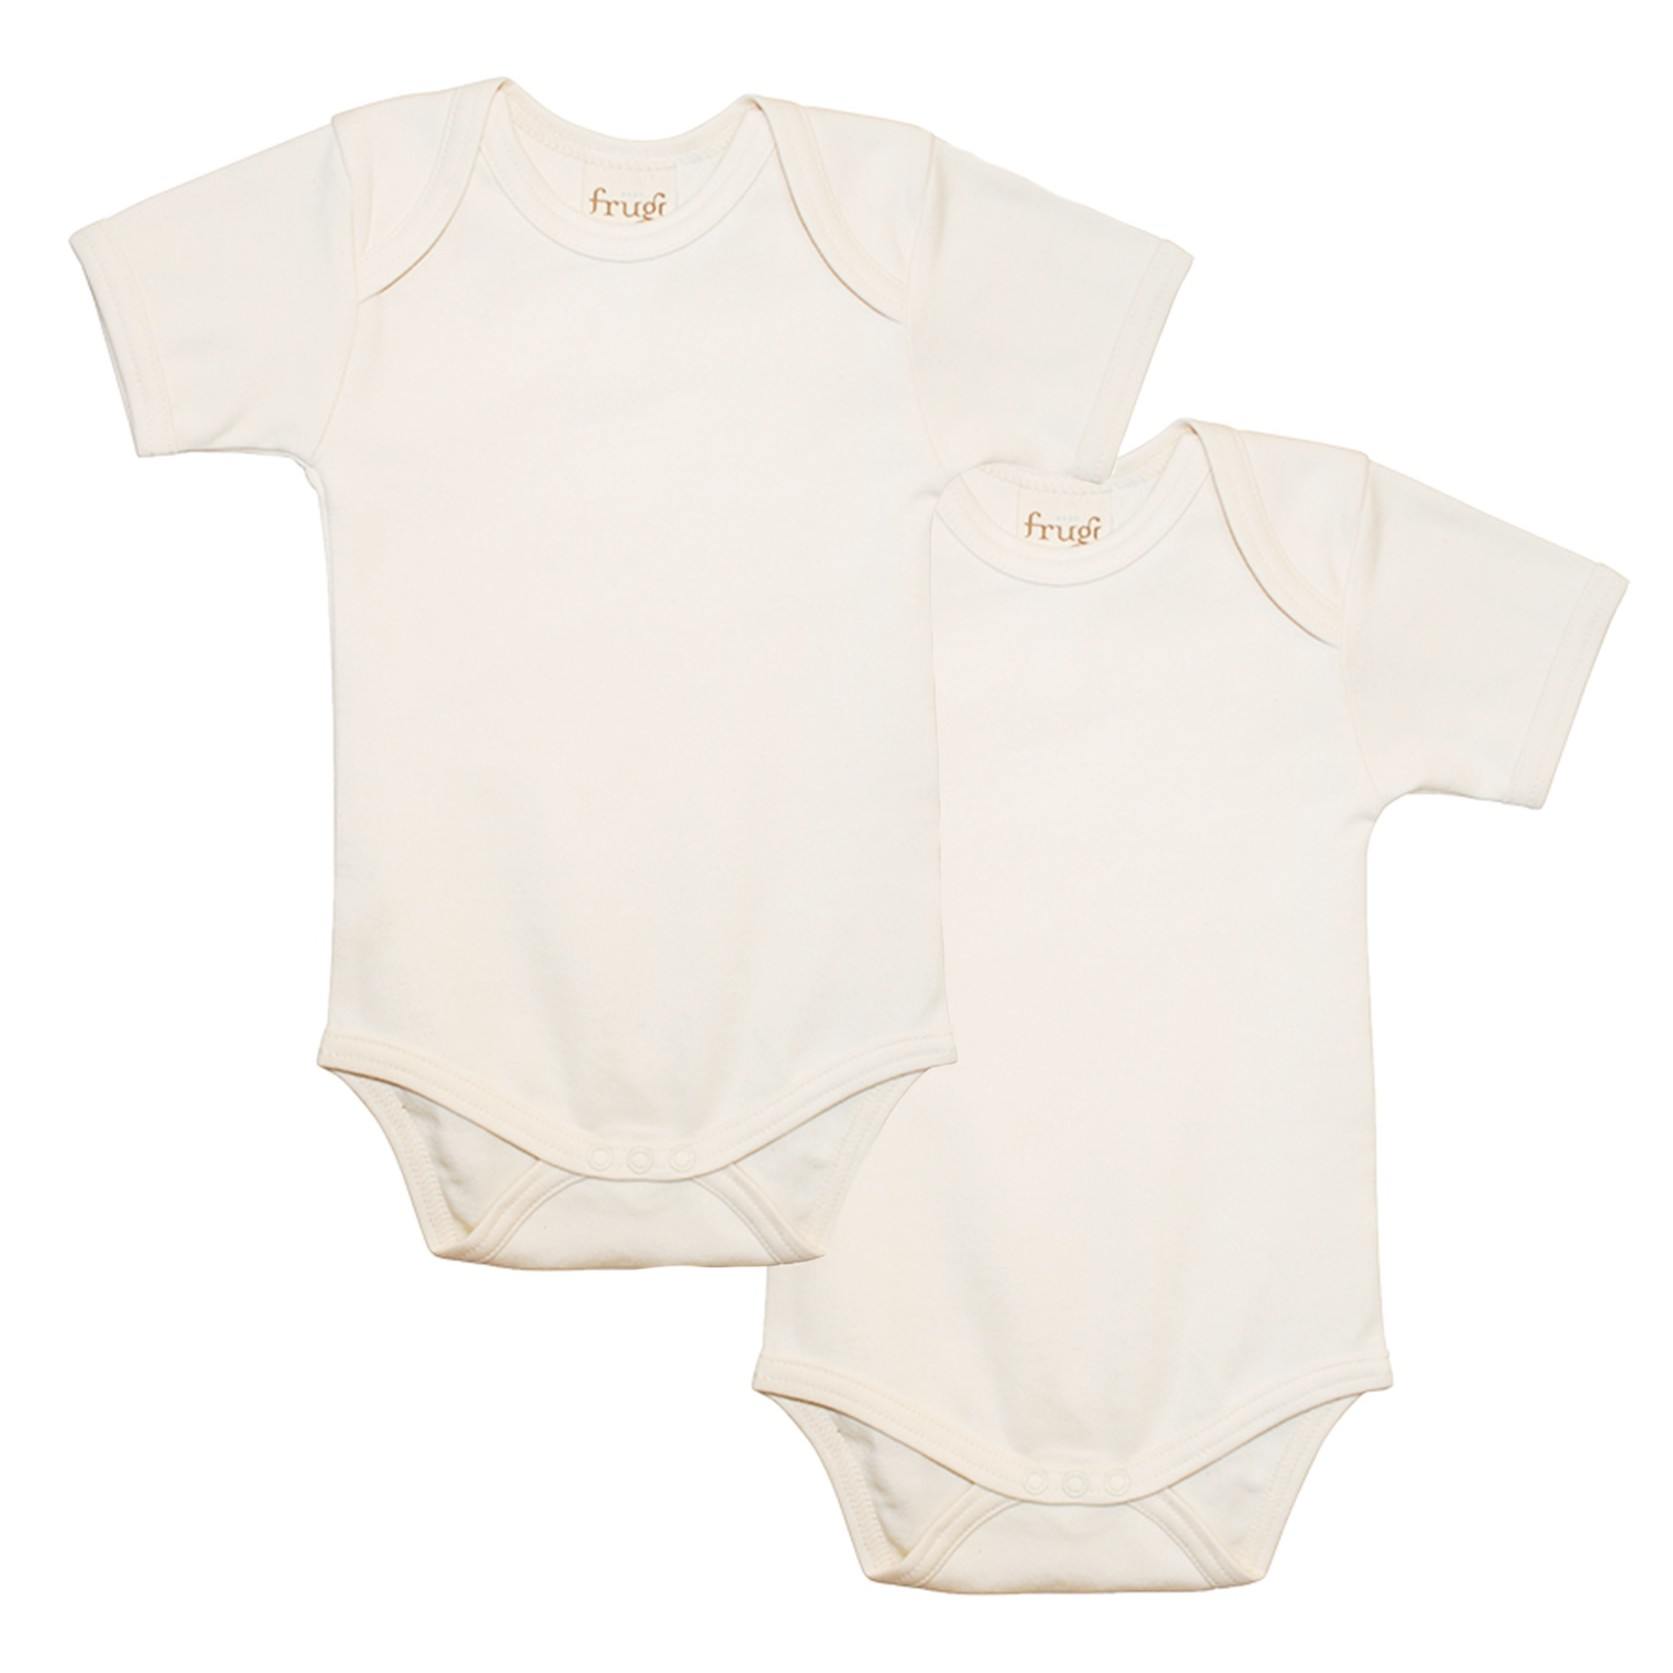 543df4021209 Frugi Organic Baby Bodies 2 Pack